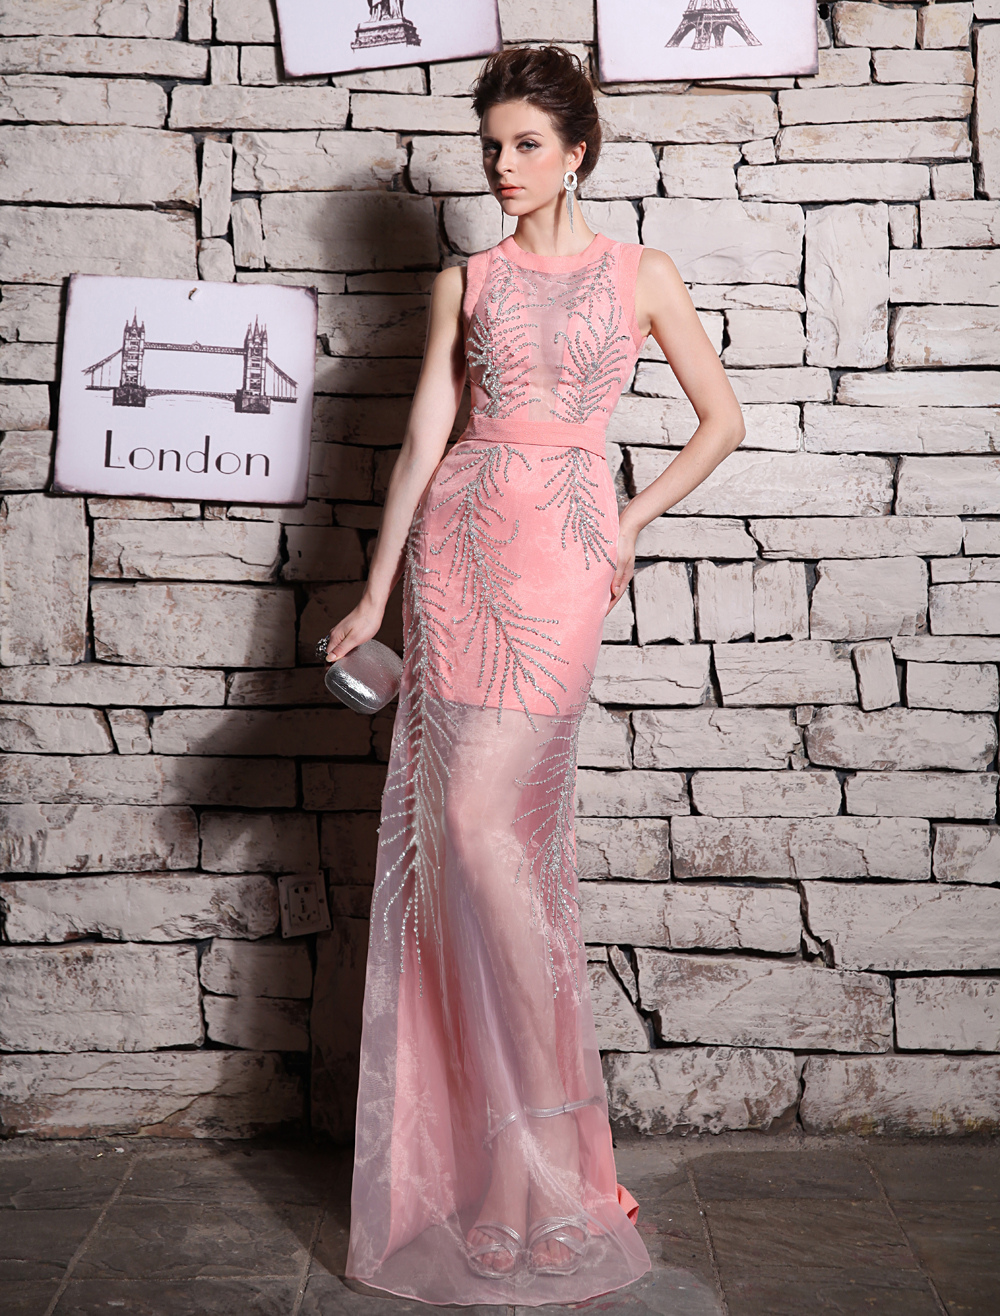 Buy Sheath Blushing Pink Organza Beading Jewel Neck Evening Dress with Floor-Length Design Milanoo for $169.99 in Milanoo store